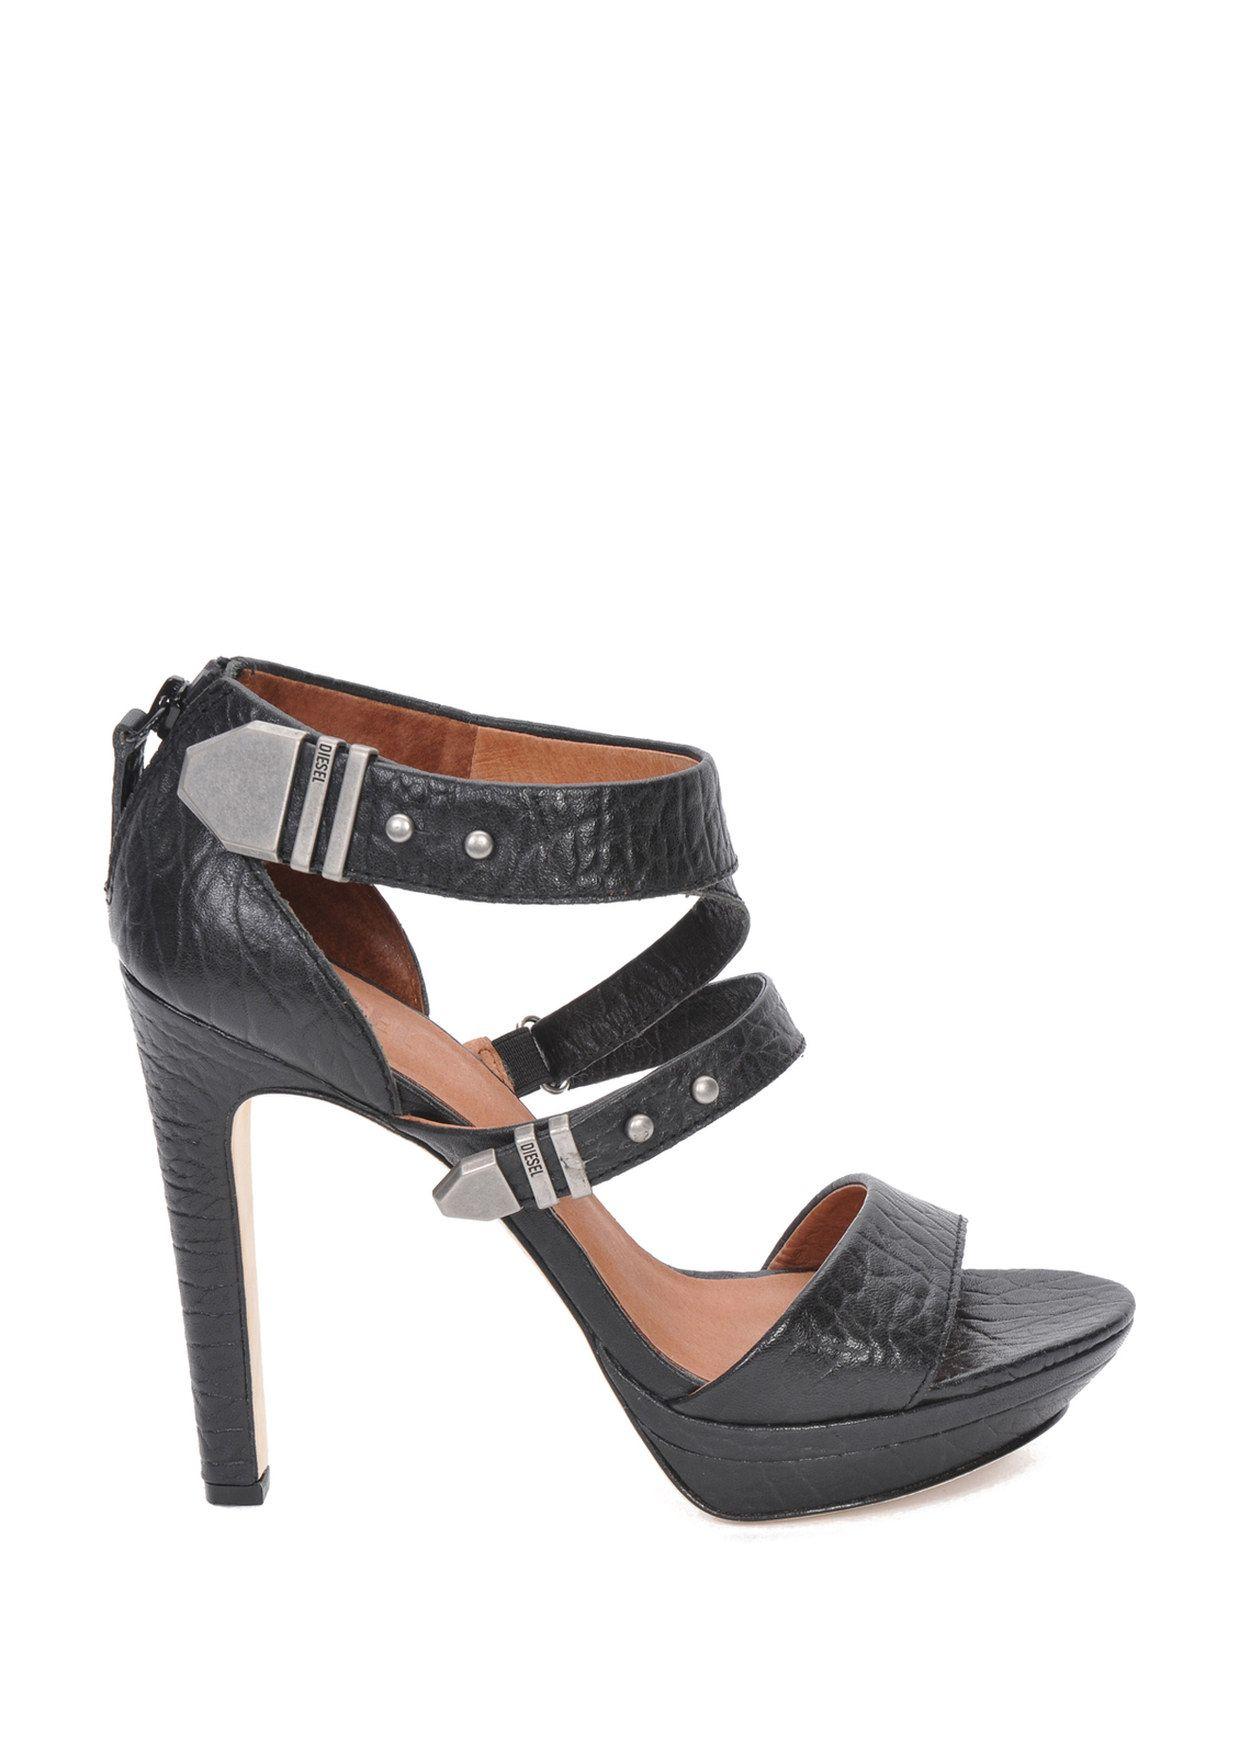 Christian Louboutin Blue Suede Harler 100 sandals | Browns